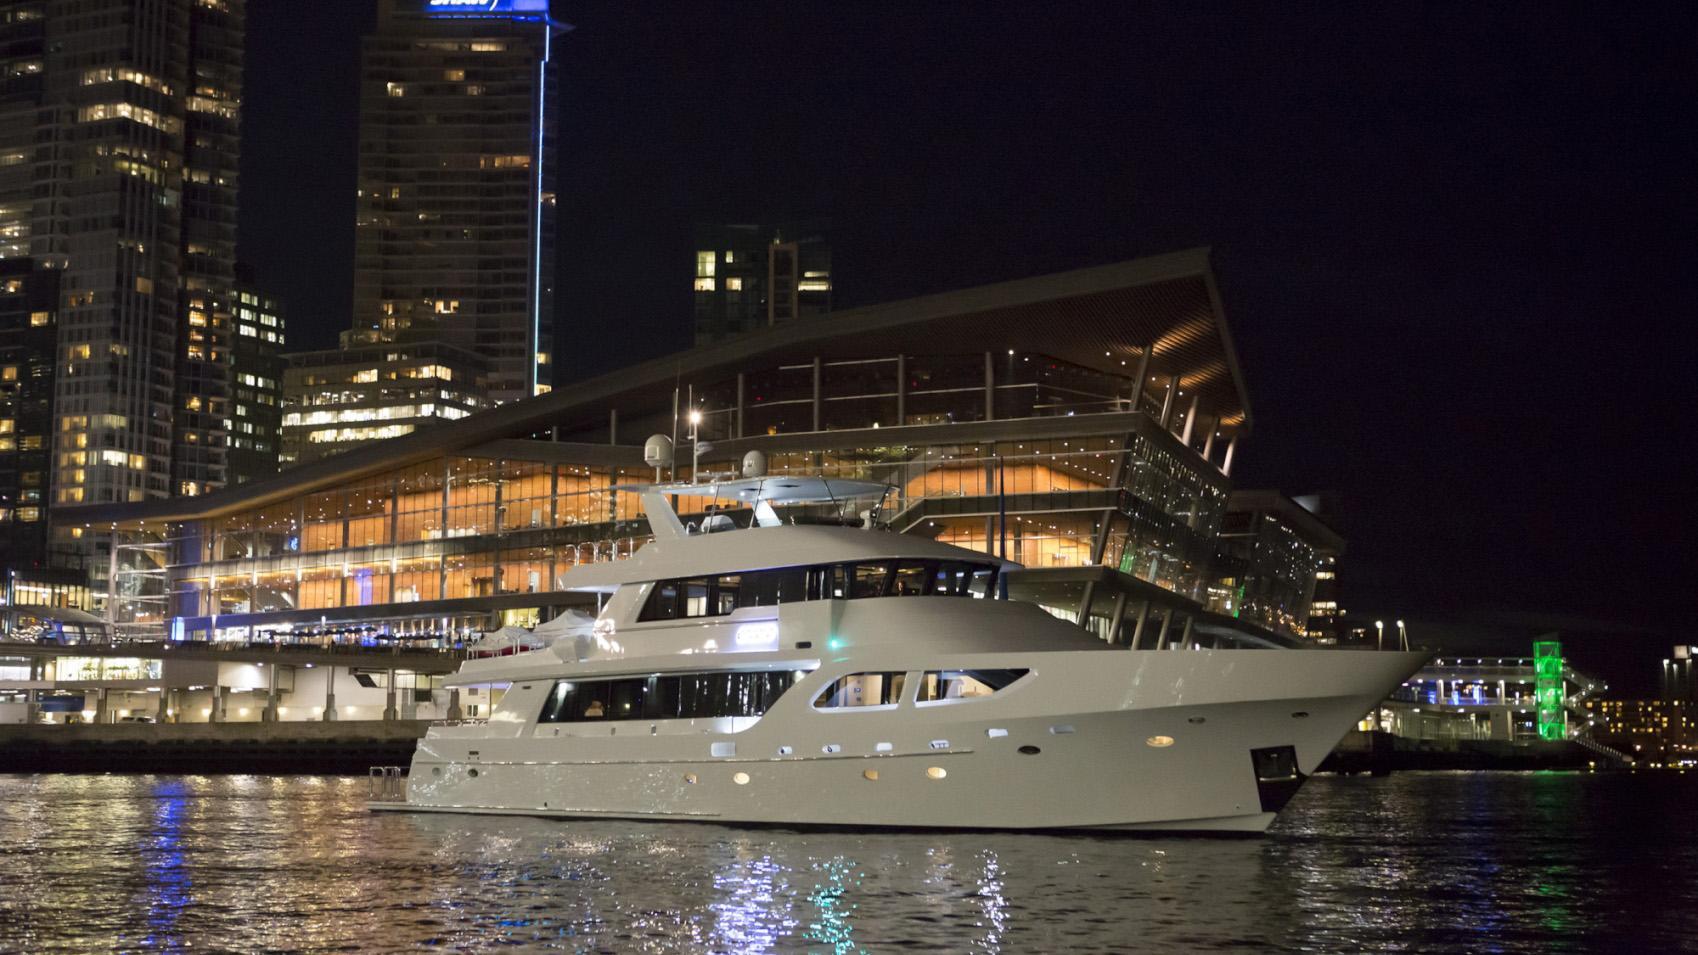 Encore motor yacht for sale profile night